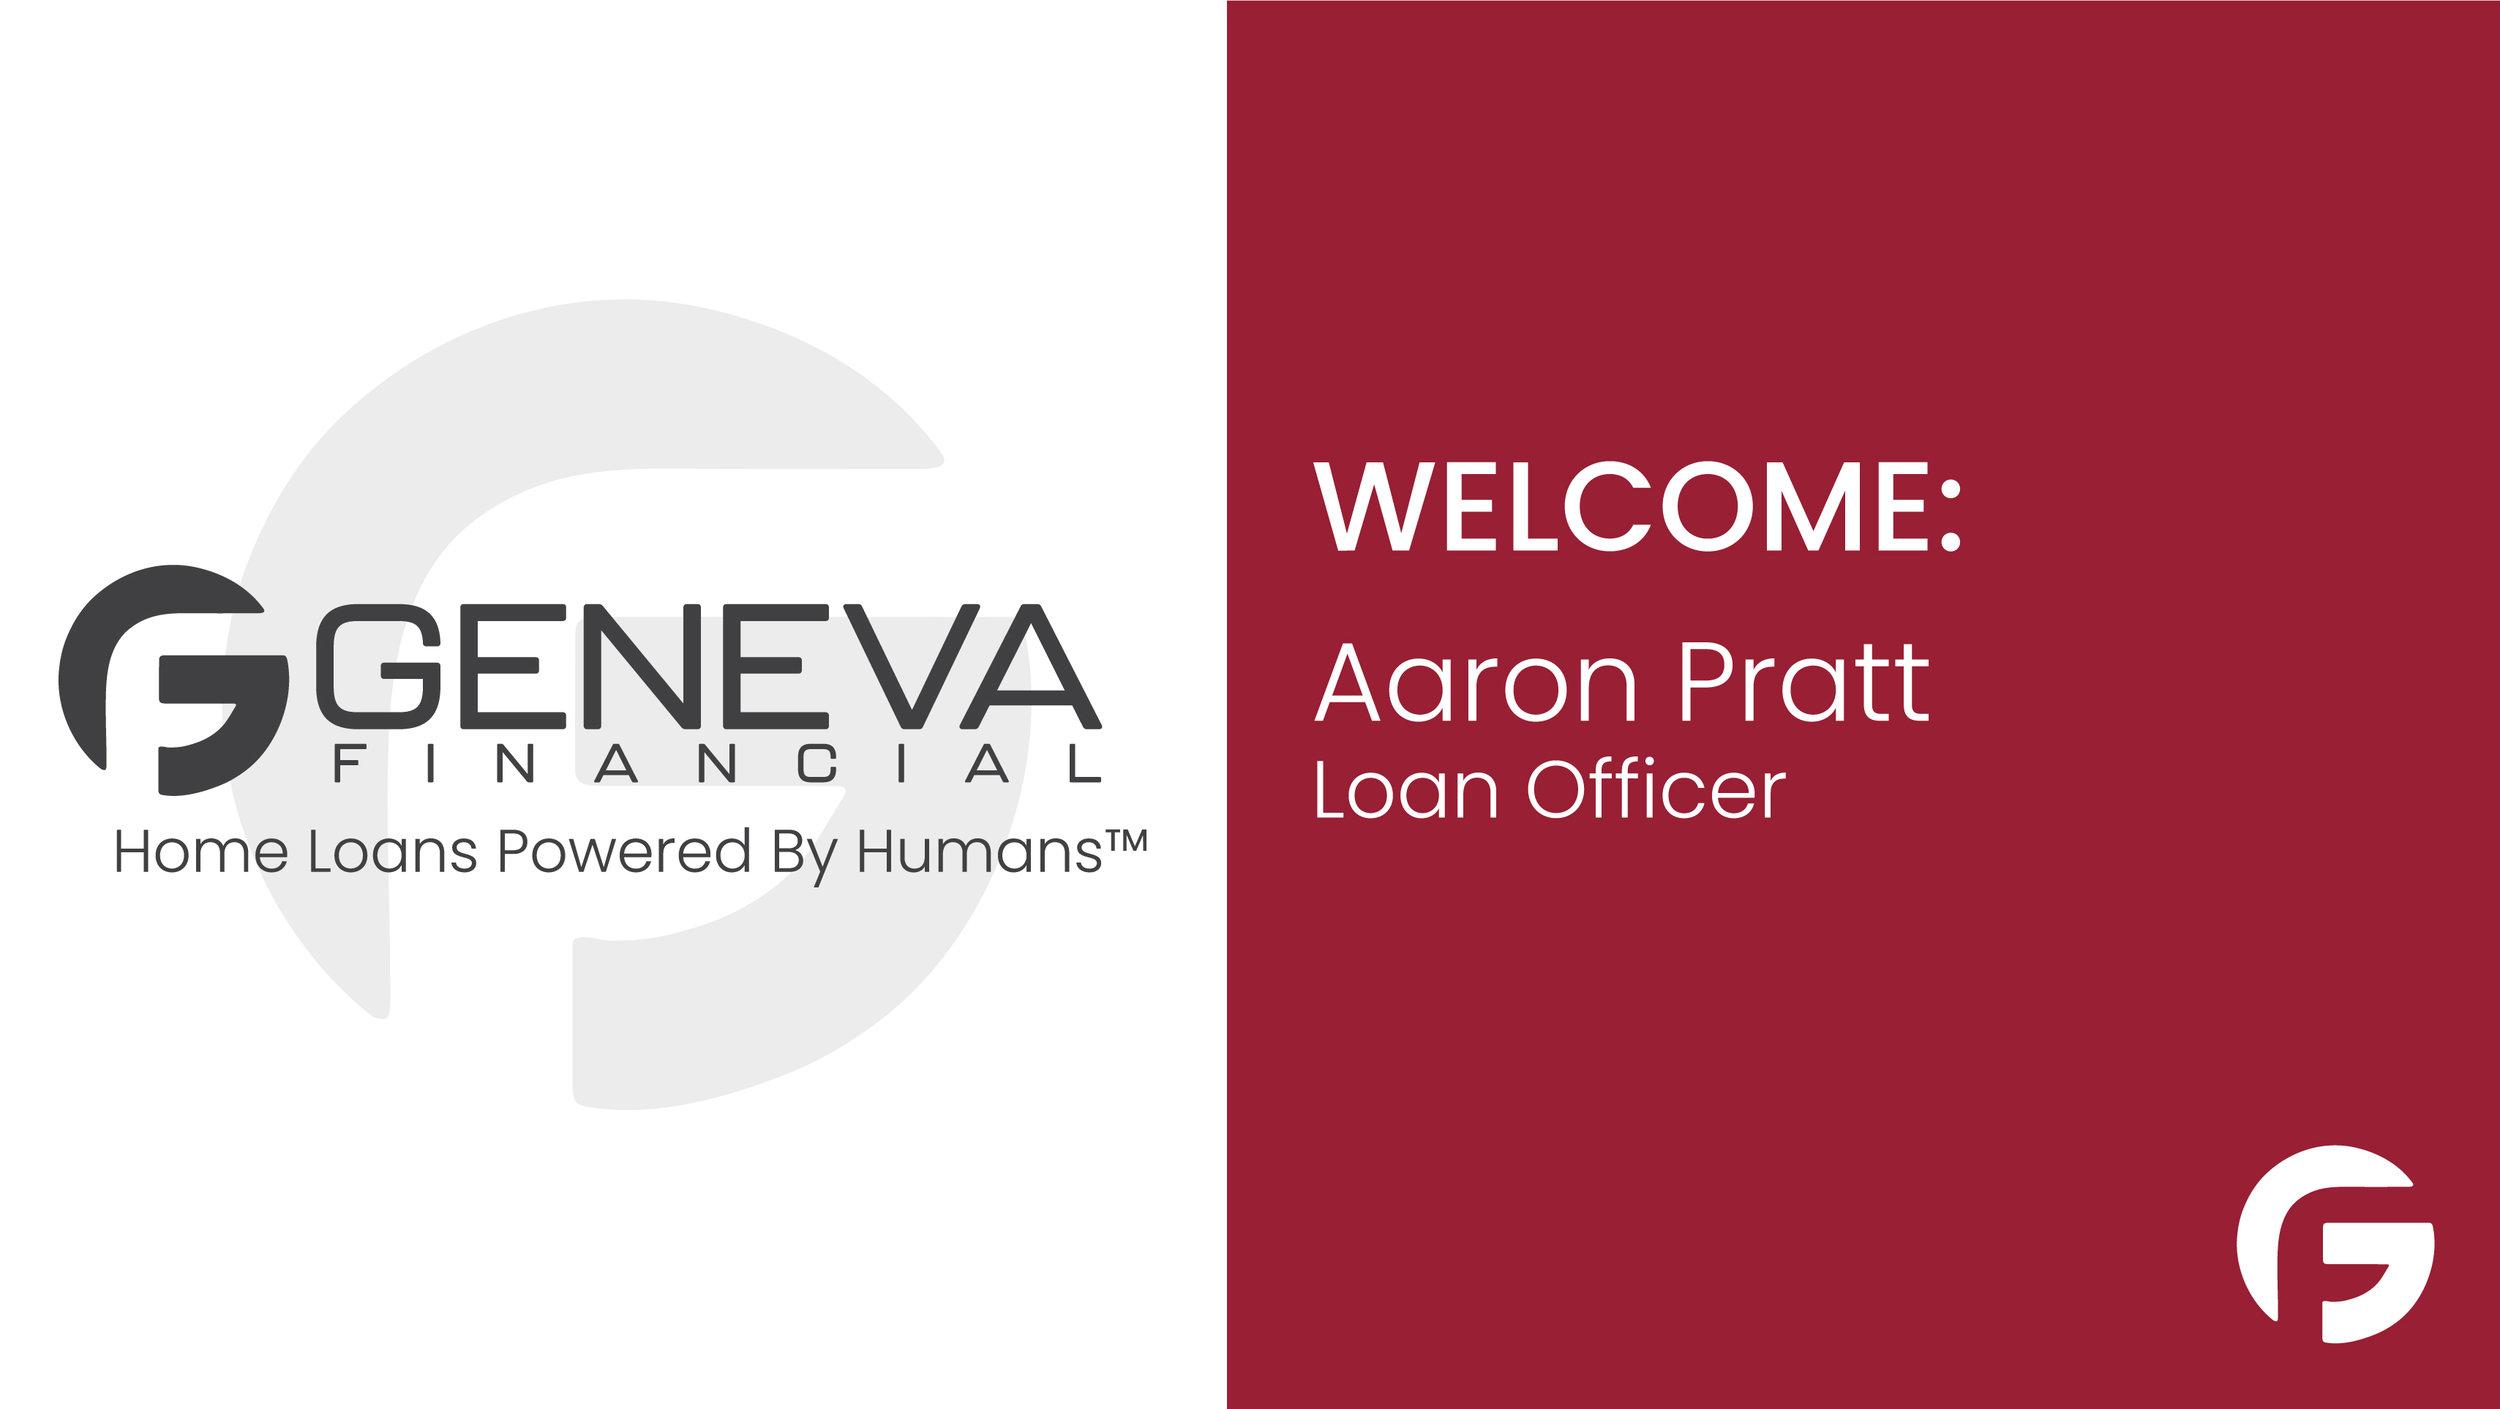 Aaron Pratt Loan Officer serving Oregon and Washington